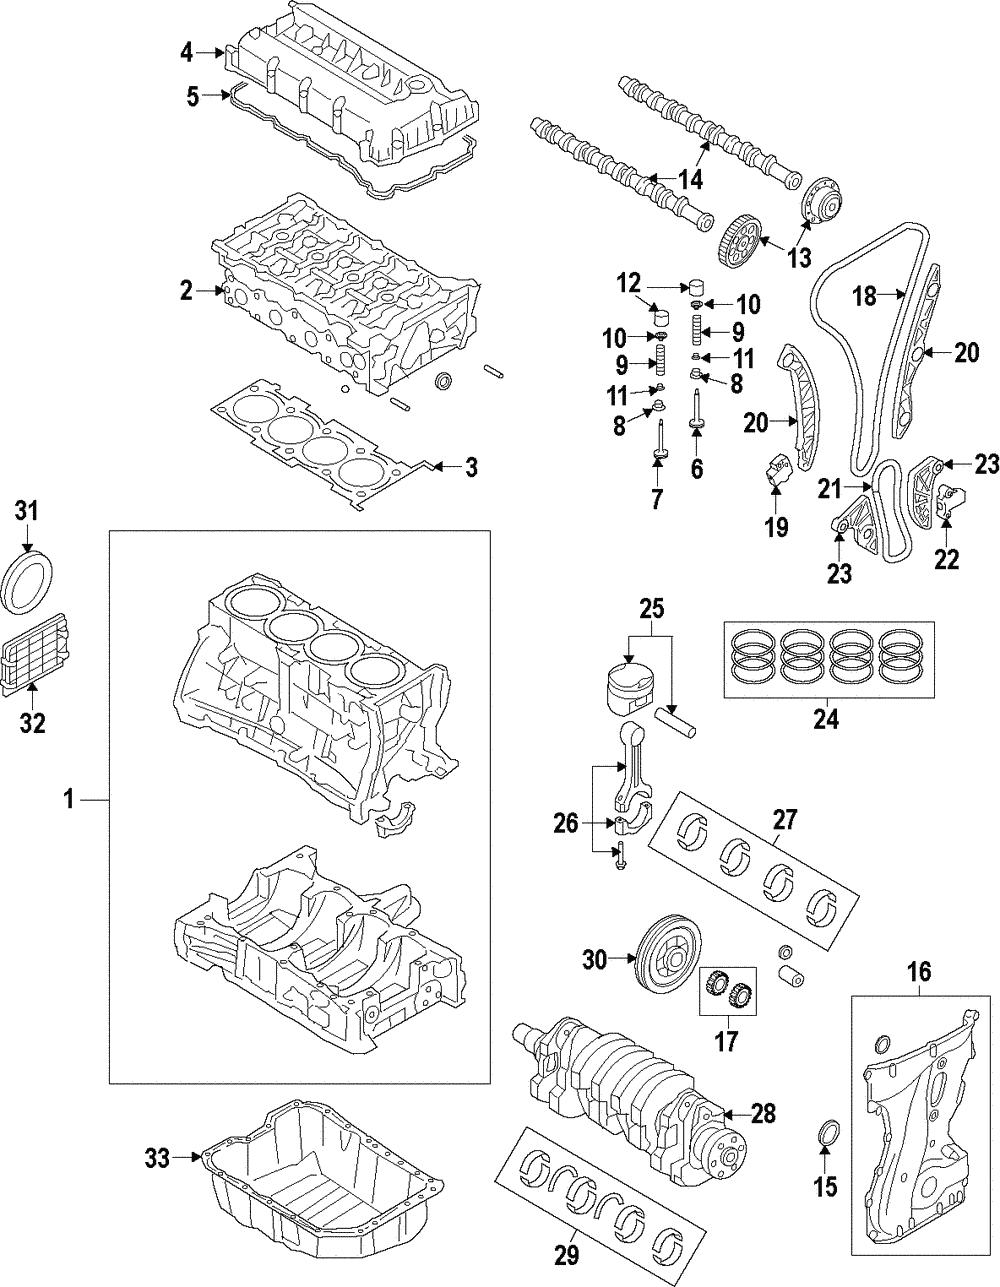 Astounding Genuine Kia Intake Camshaft 24100 2G000 Ebay Wiring Digital Resources Operbouhousnl